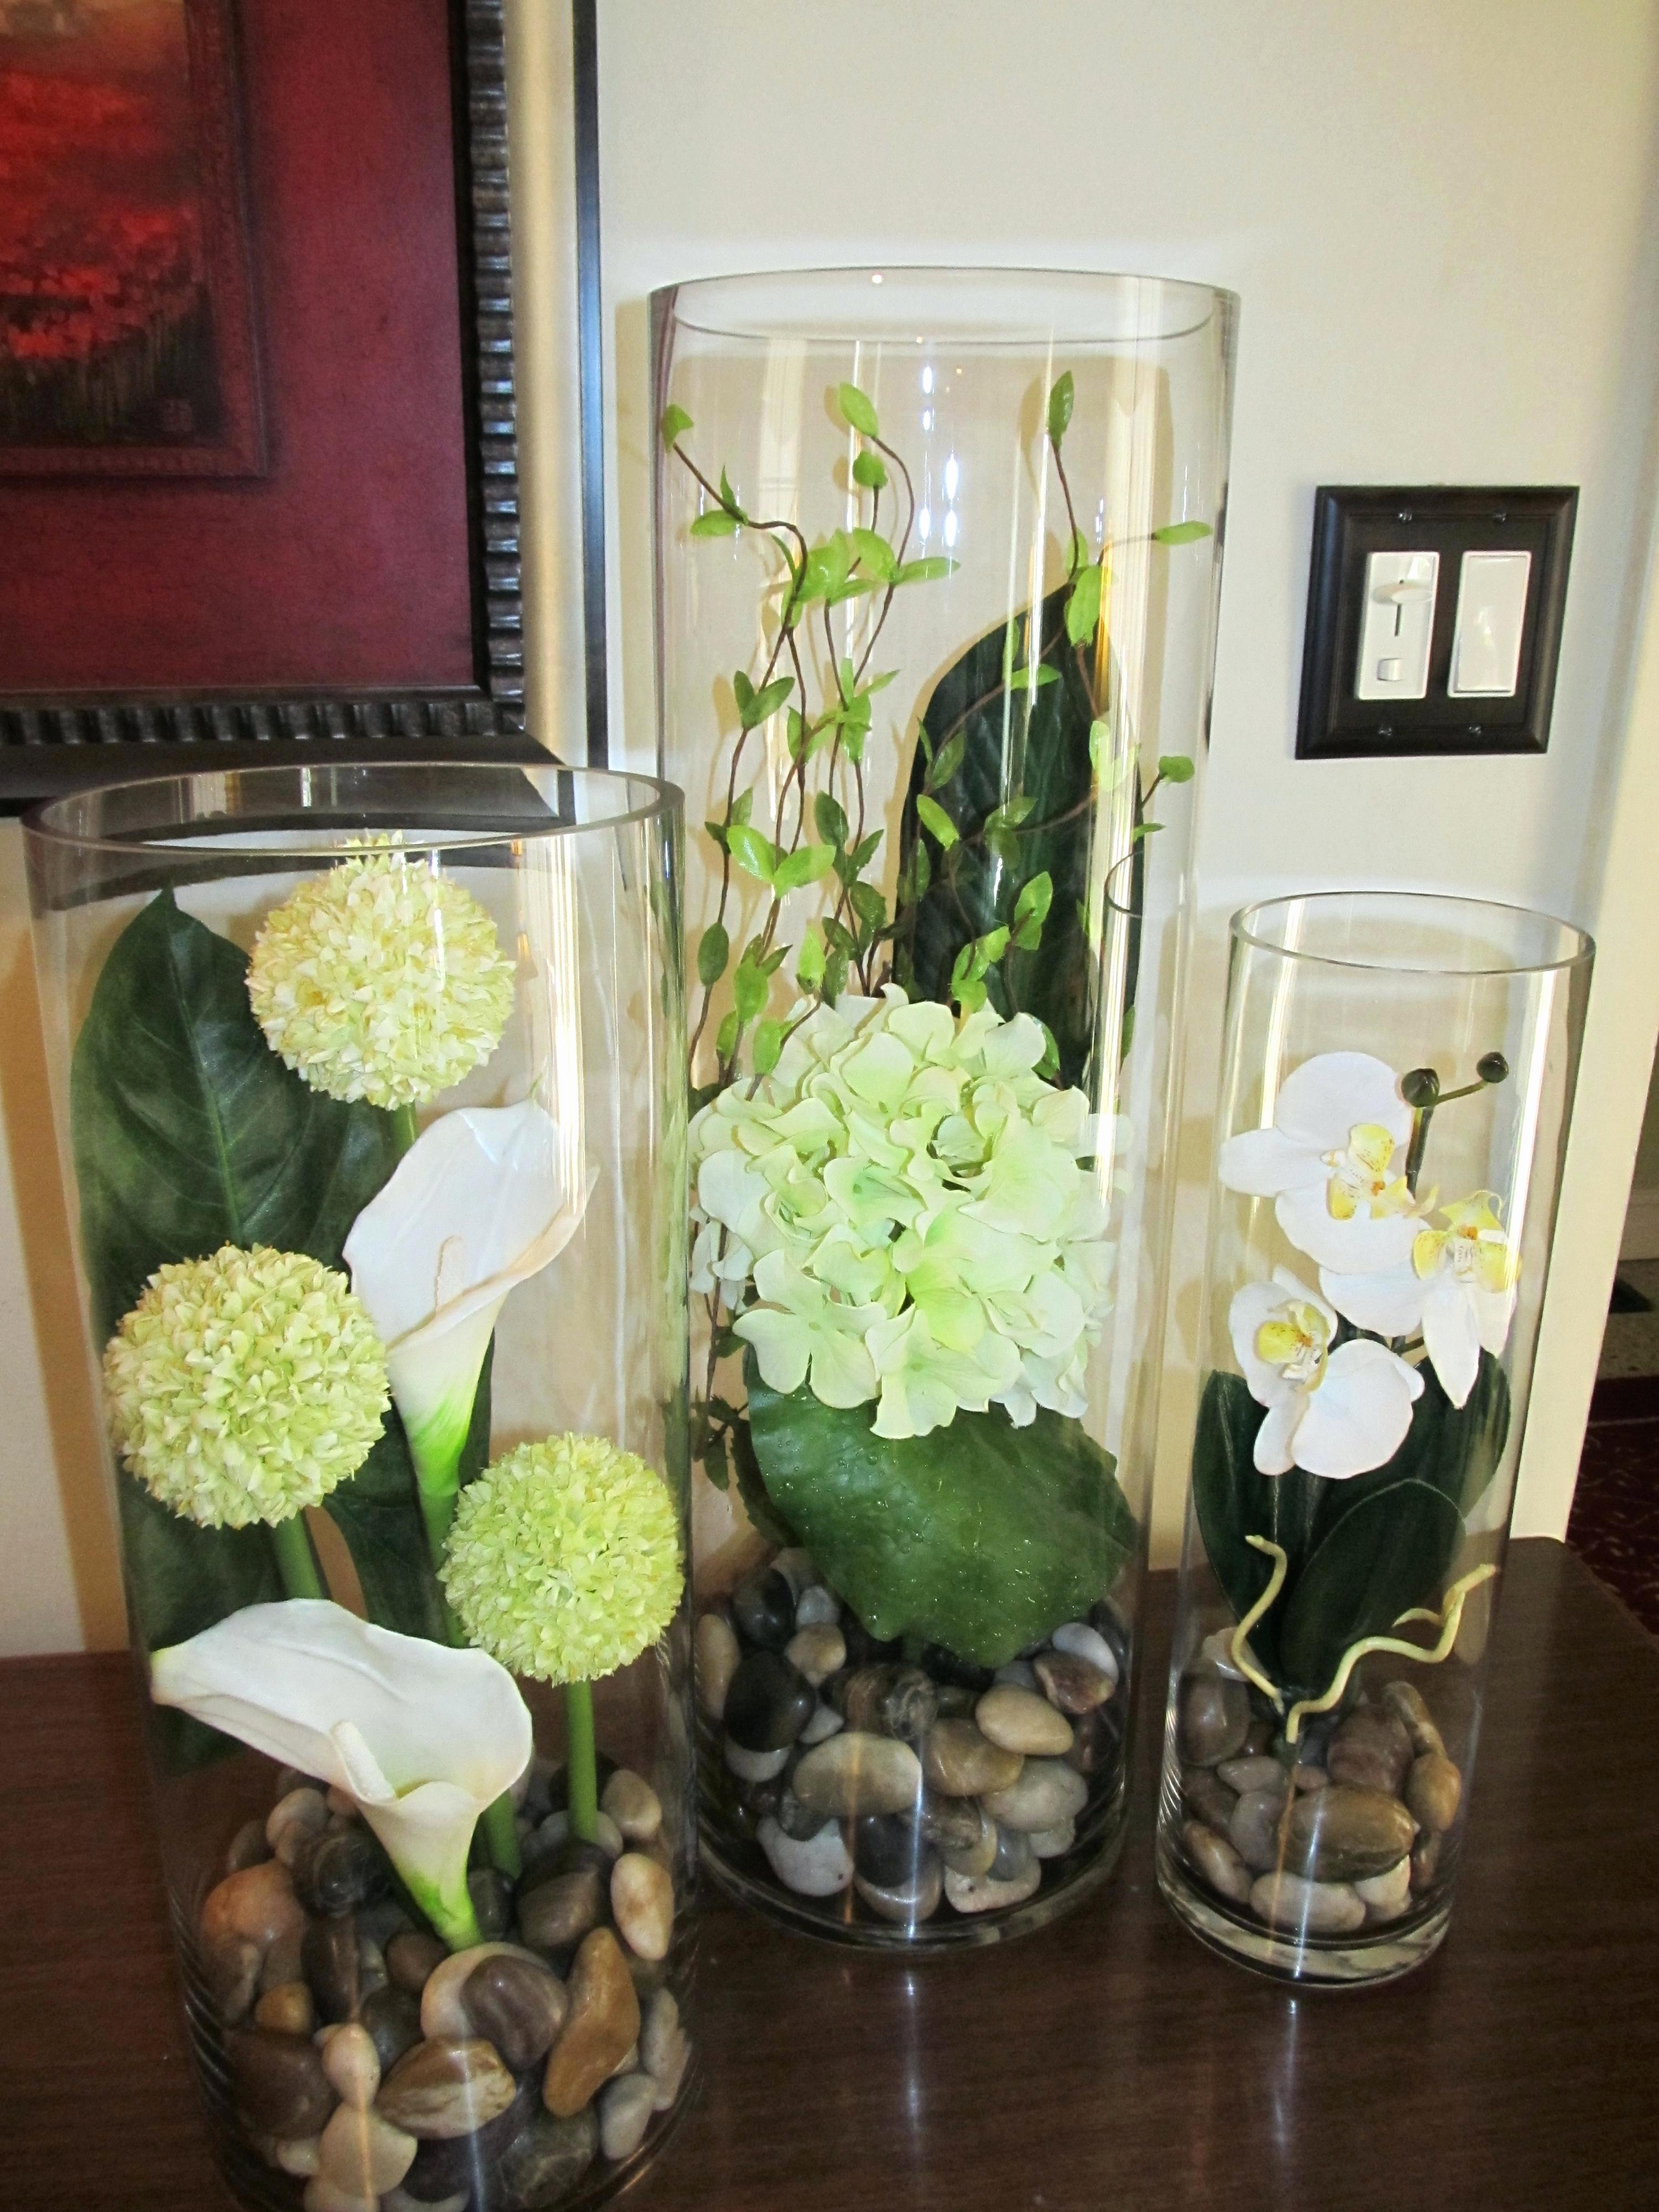 buy cheap cylinder vases in bulk of 10 beautiful cylinder glass vases in bulk bogekompresorturkiye com intended for round glass vases for centerpieces uk round designs